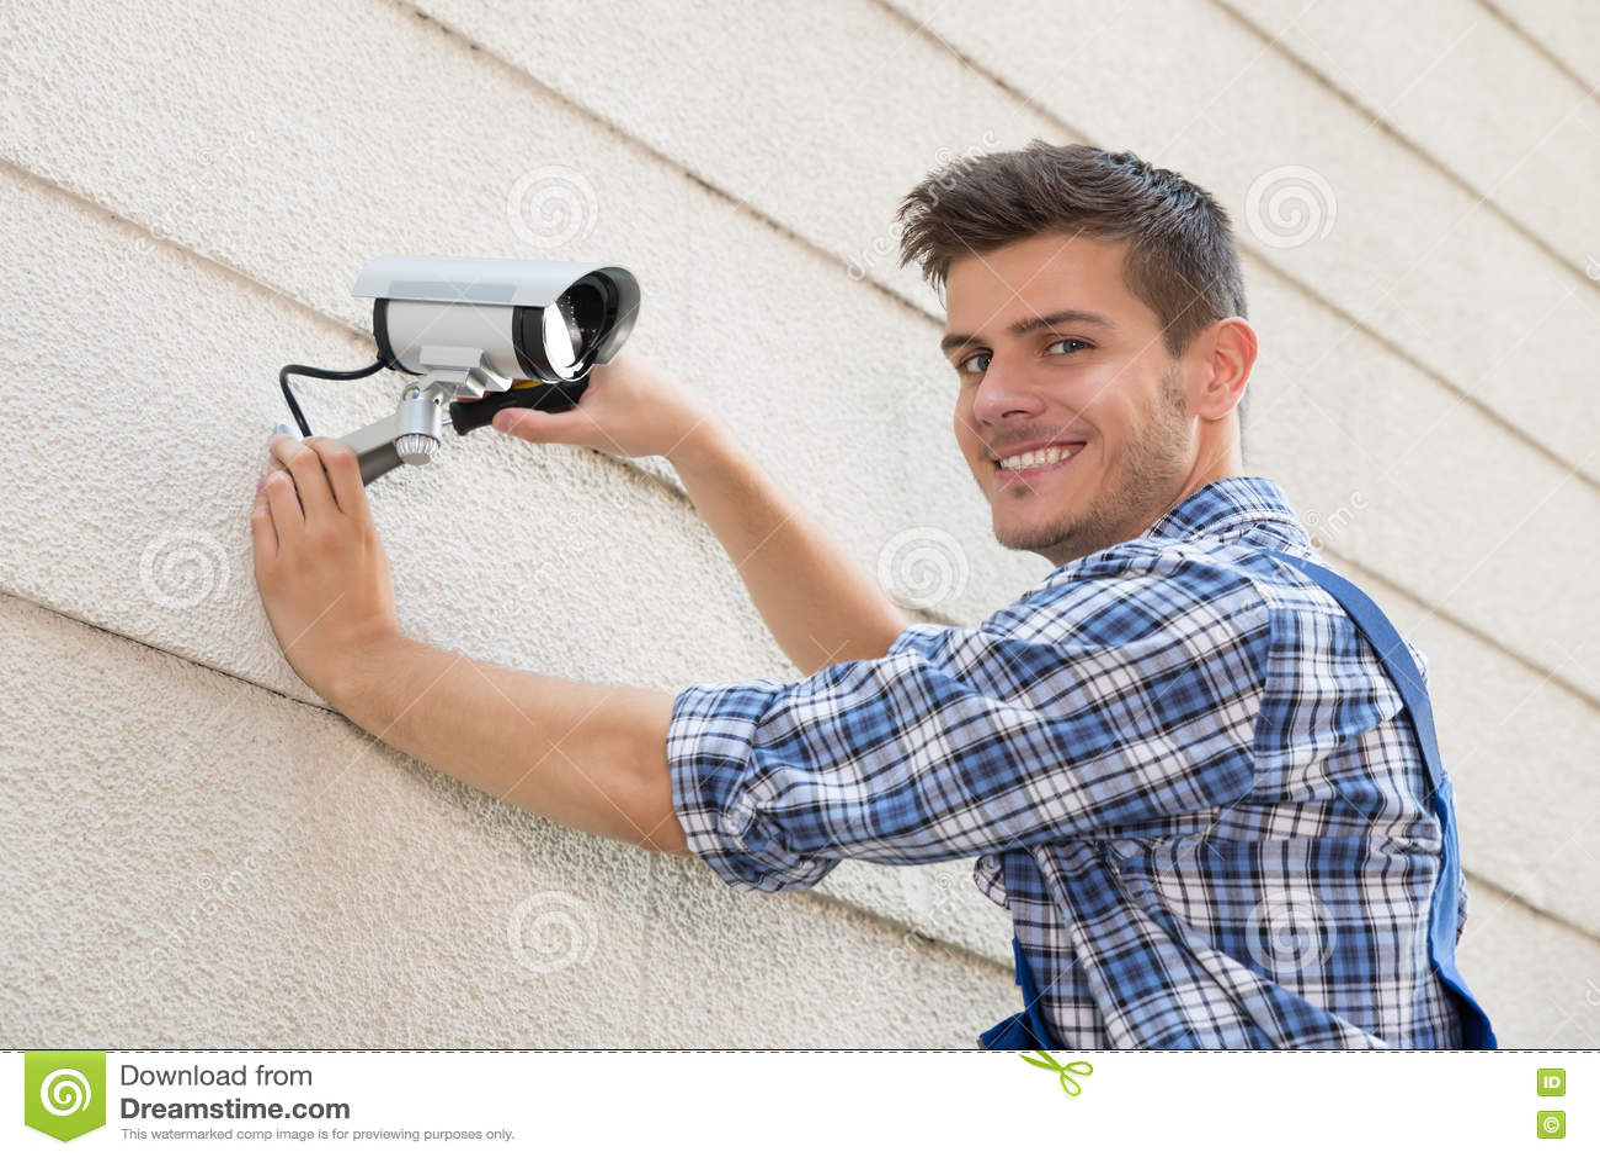 Technicus Fixing Cctv Camera op Muur